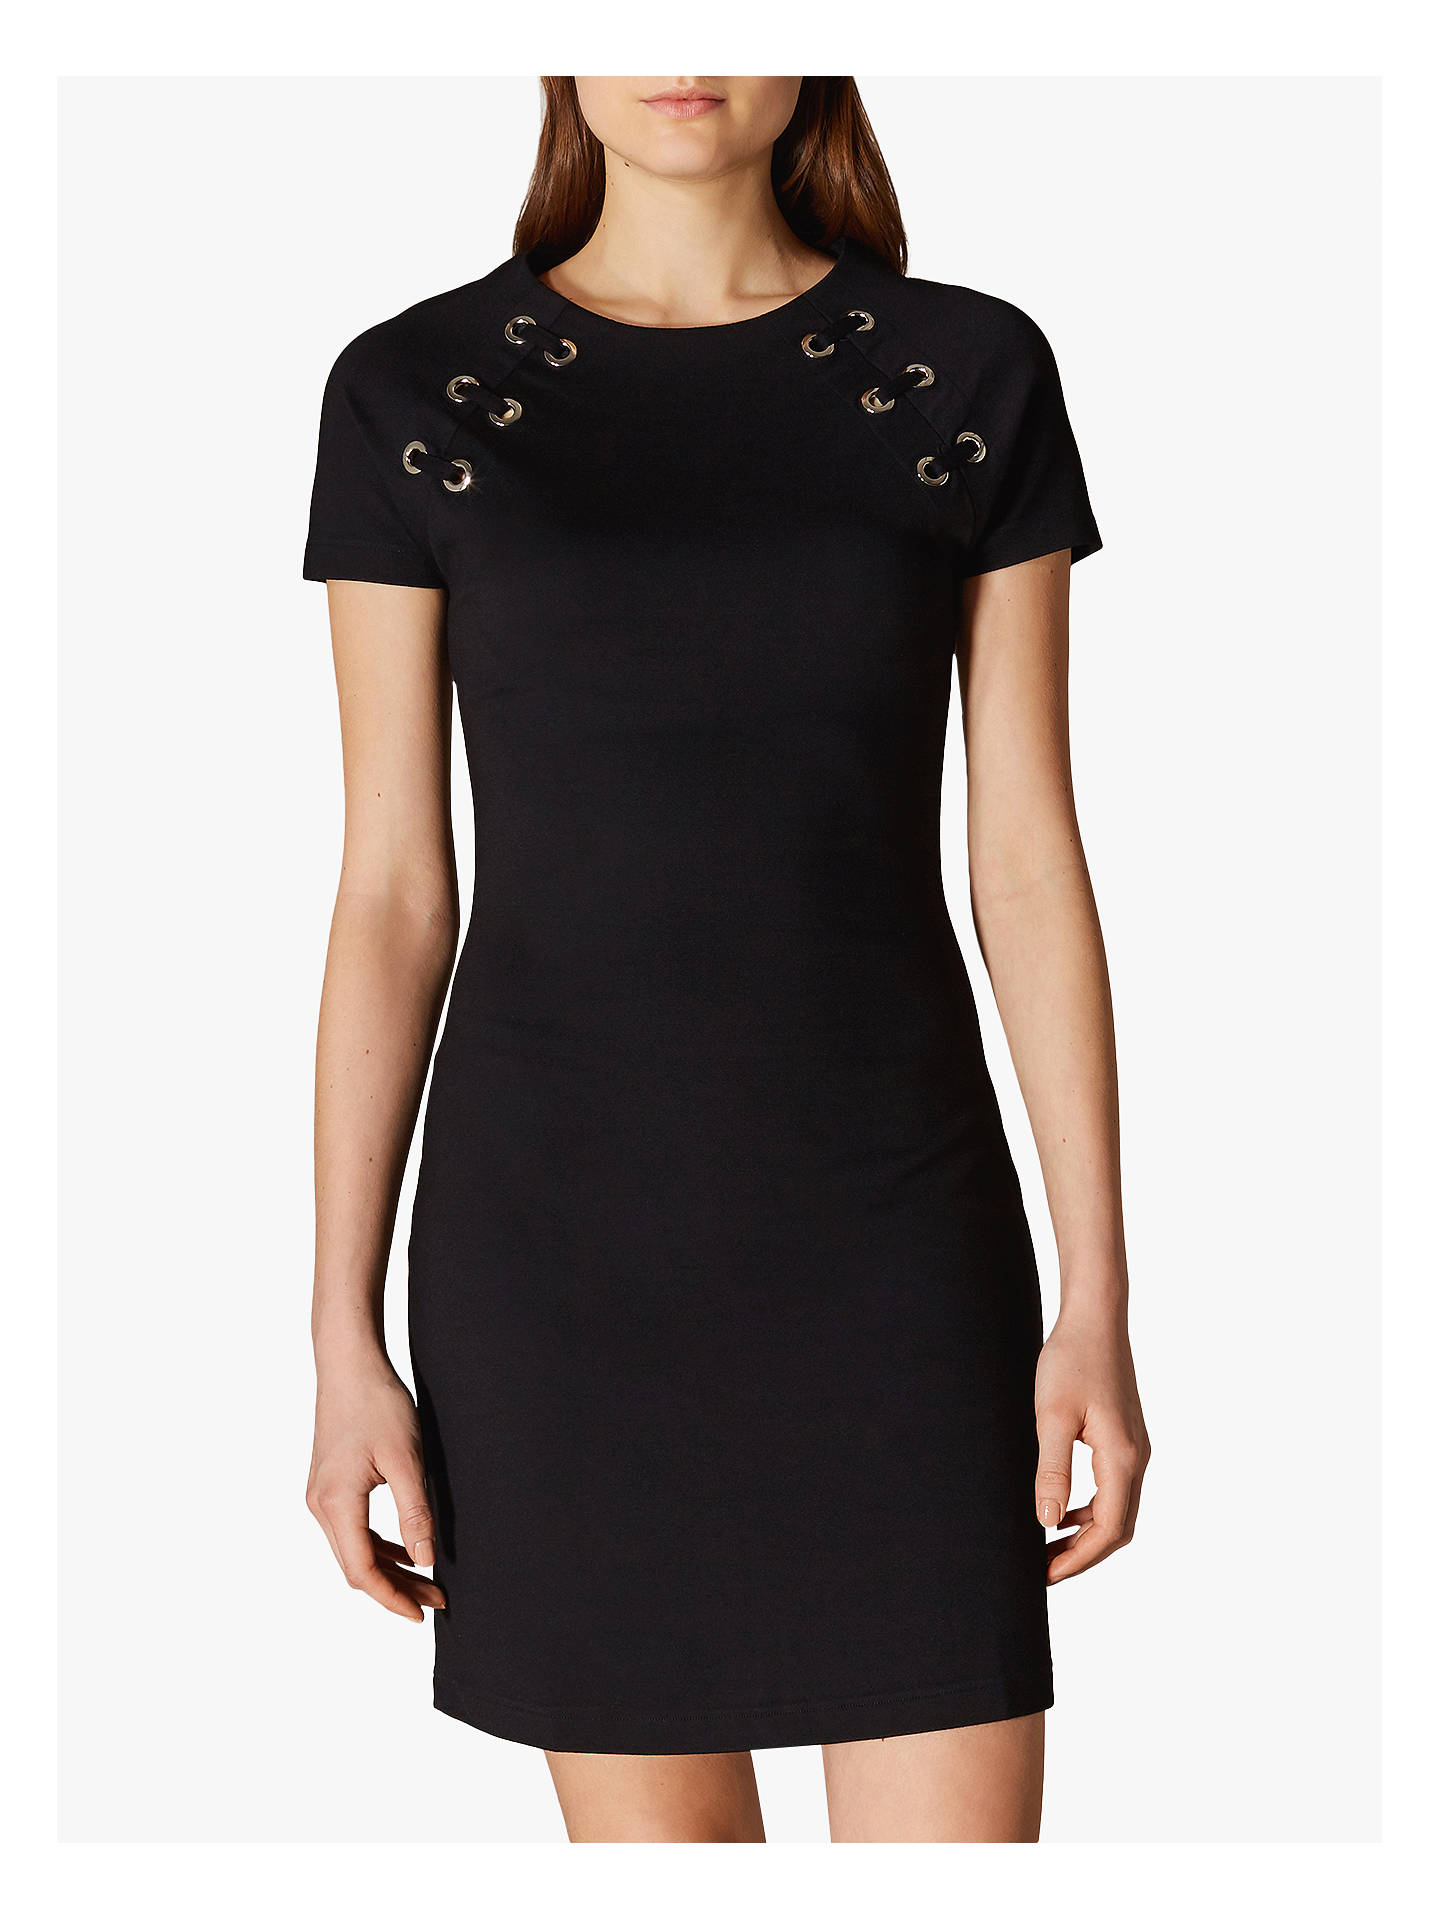 d9e0a8e0872 Buy Karen Millen Eyelet Detail Bodycon Dress